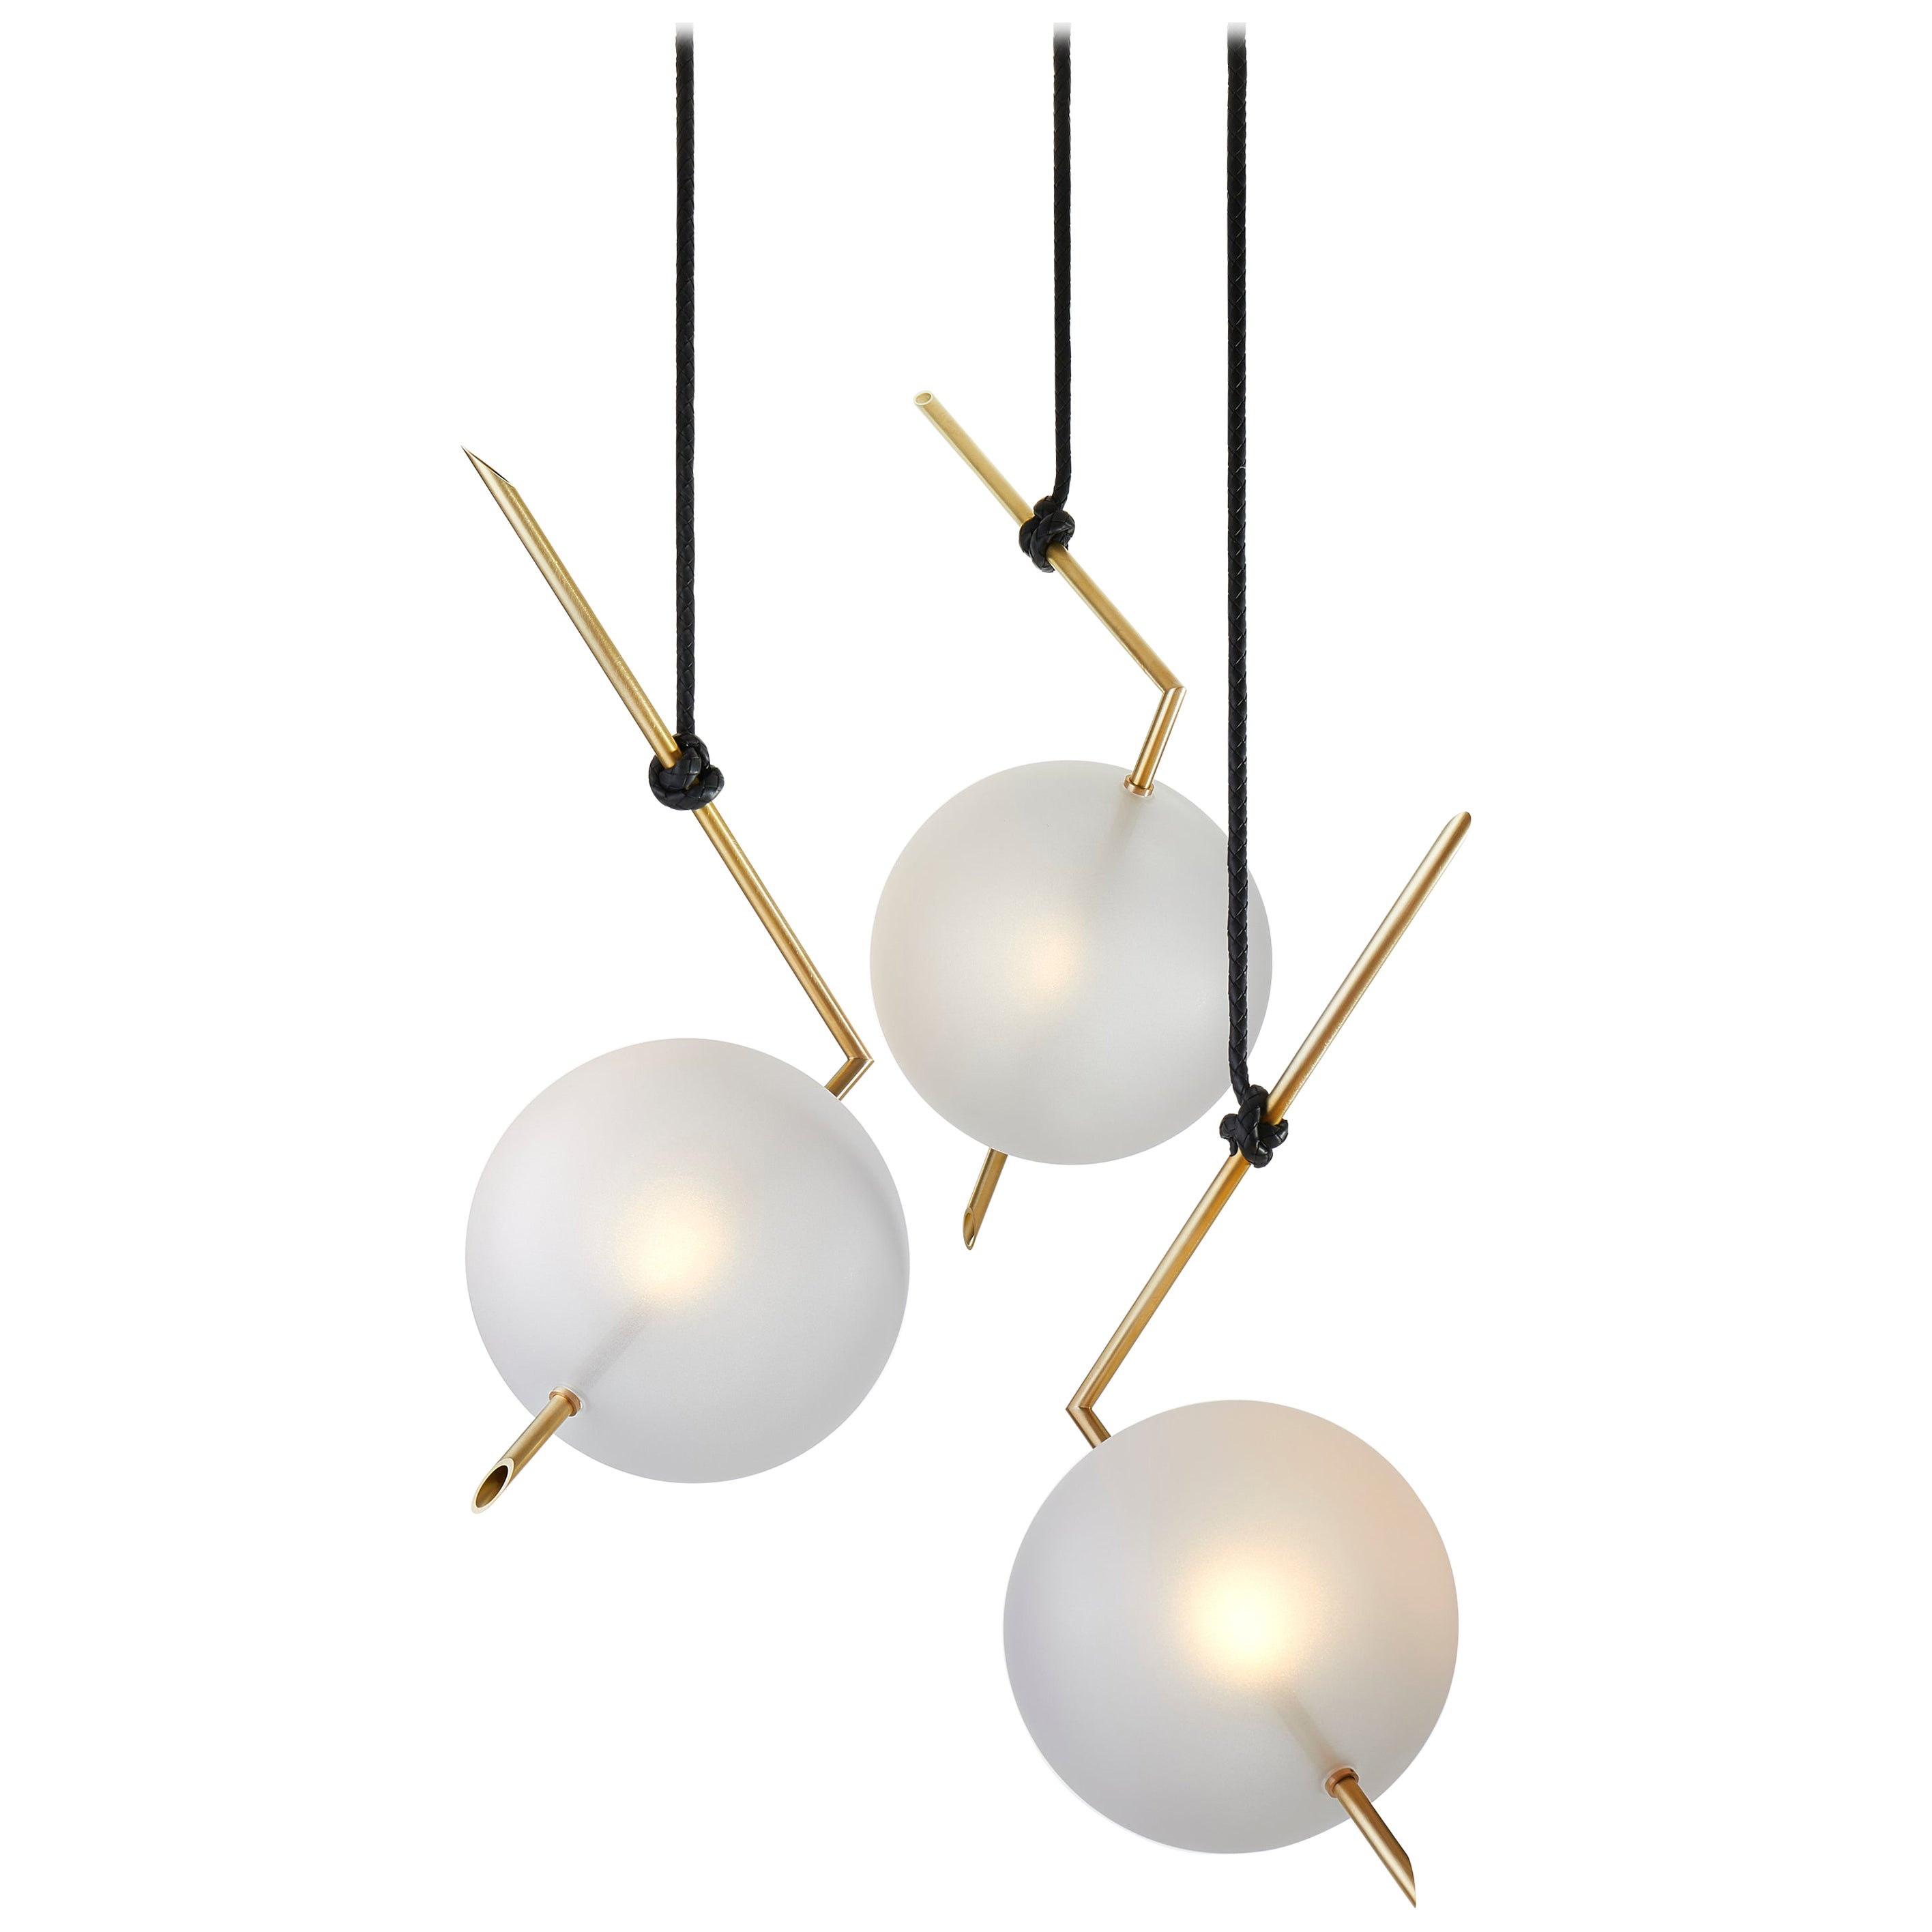 Nuvola BOLD Three Lights Stardust White Contemporary Chandelier, Handblown Glass